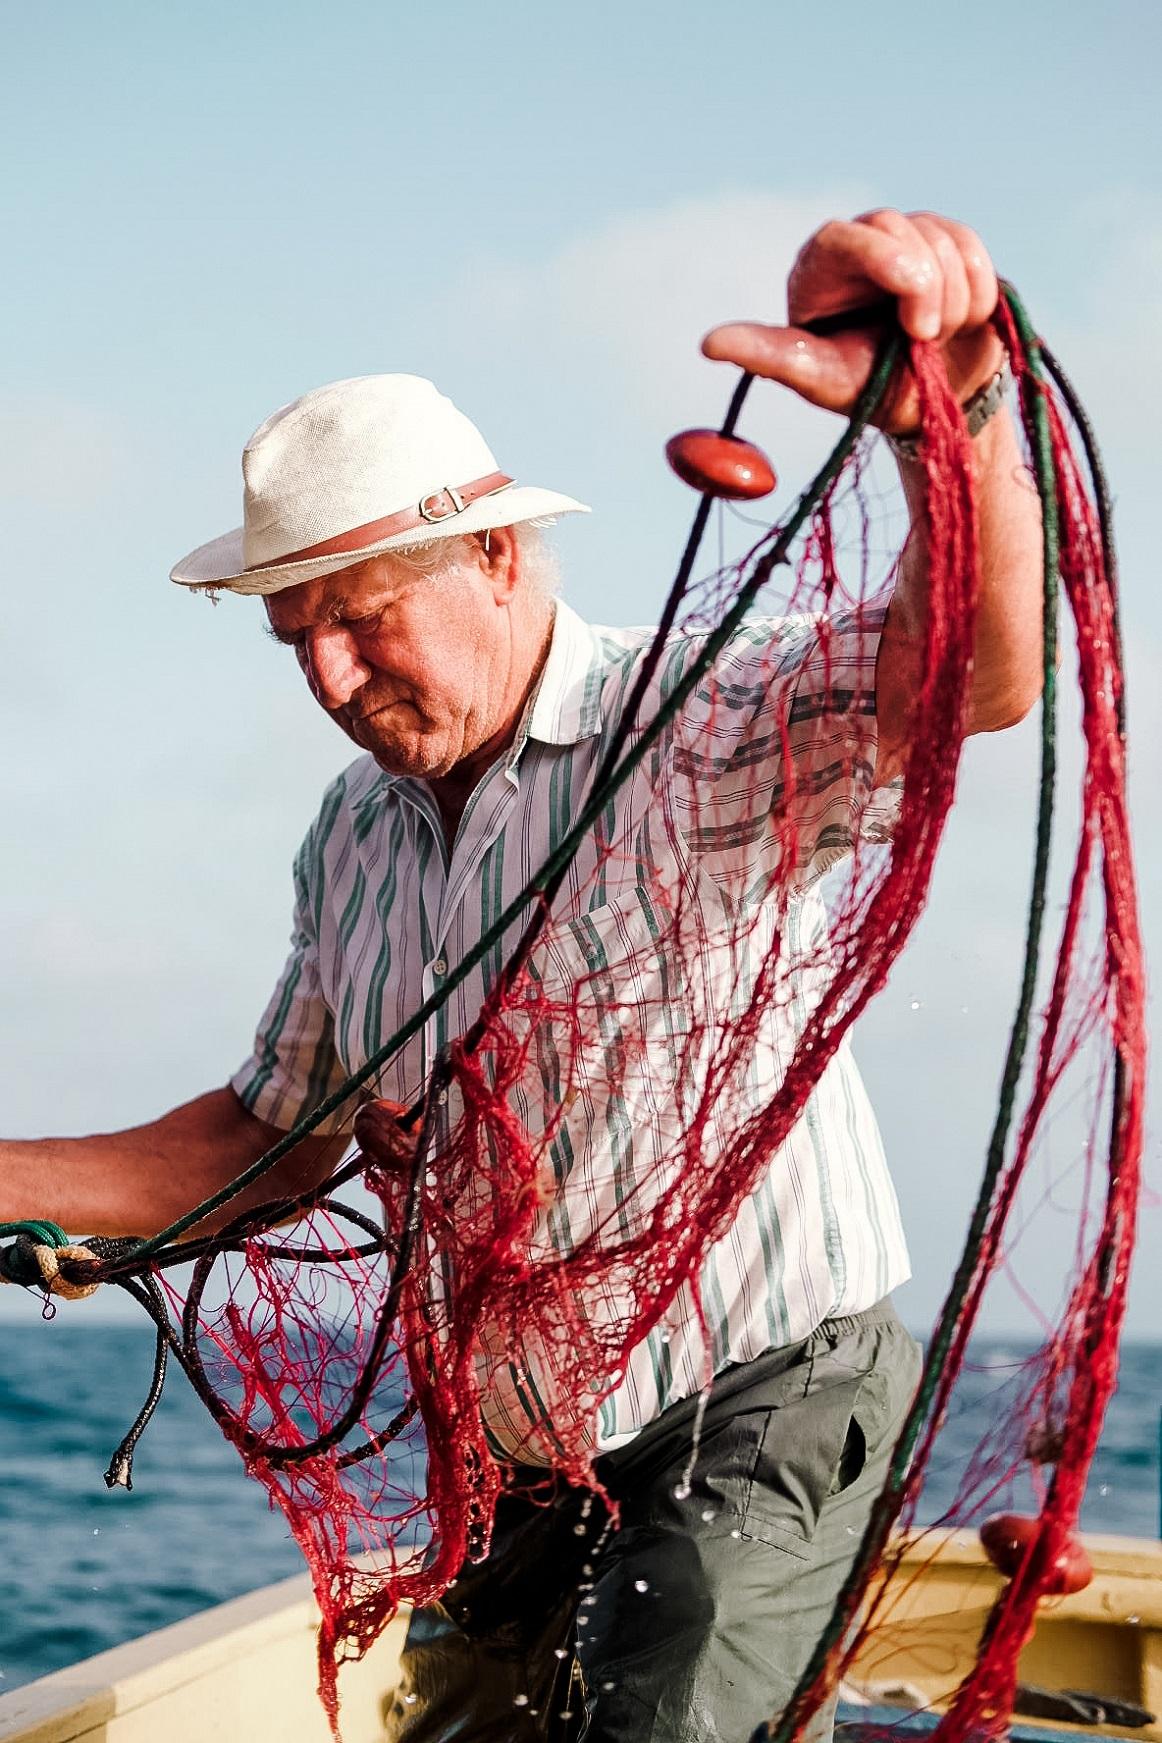 silvio pescatore alicudi eolie (2)